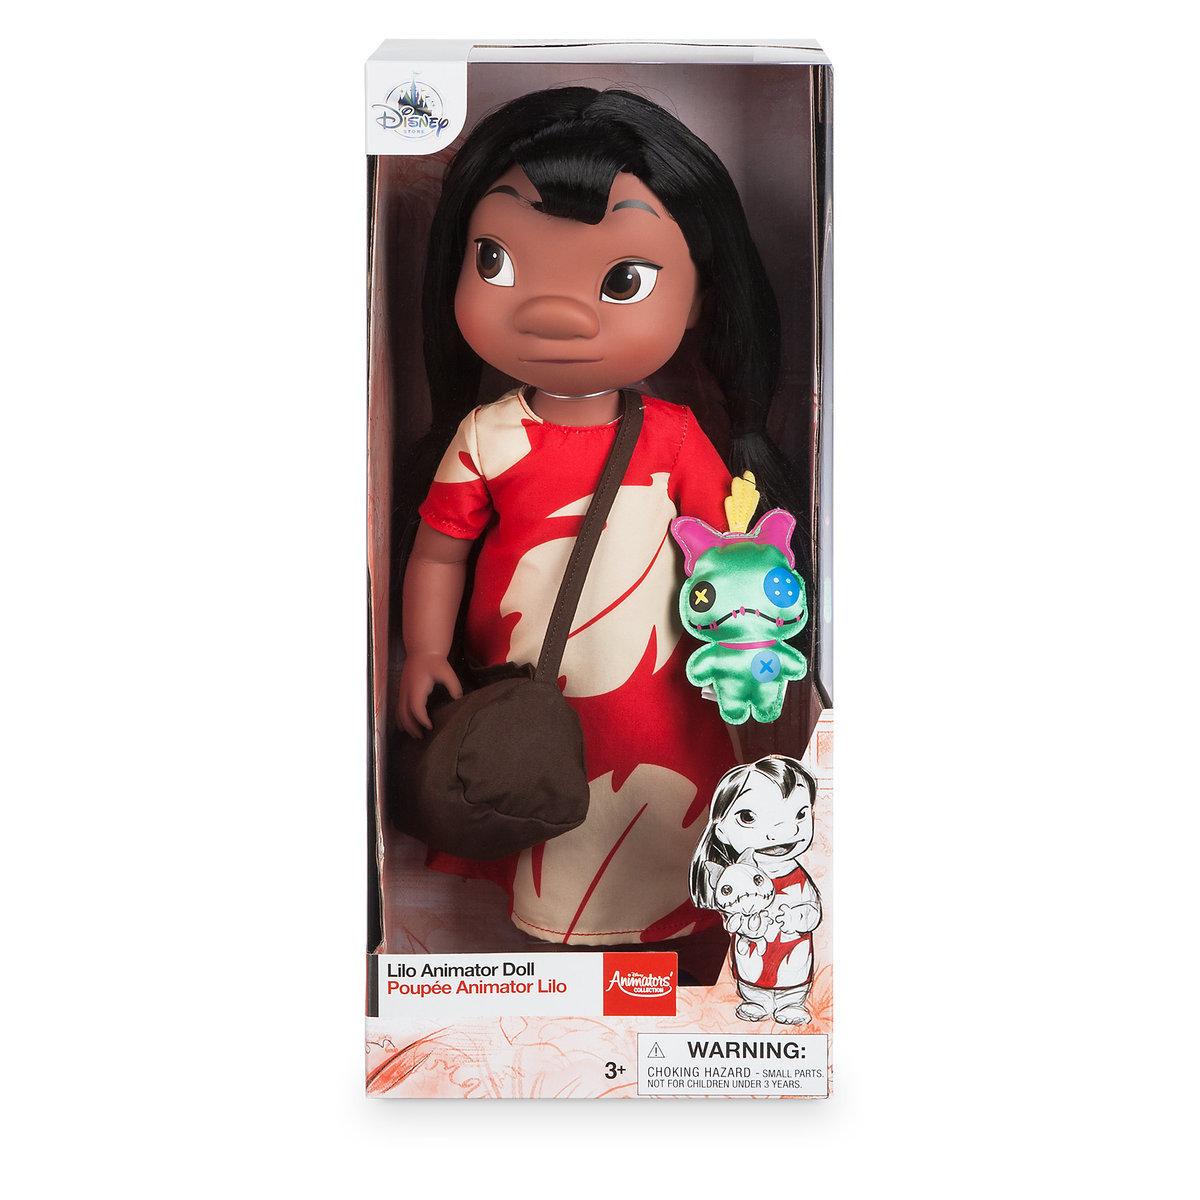 Disney Animators' Collection Lilo Doll - 16'' ของแท้ นำเข้าจากอเมริกา